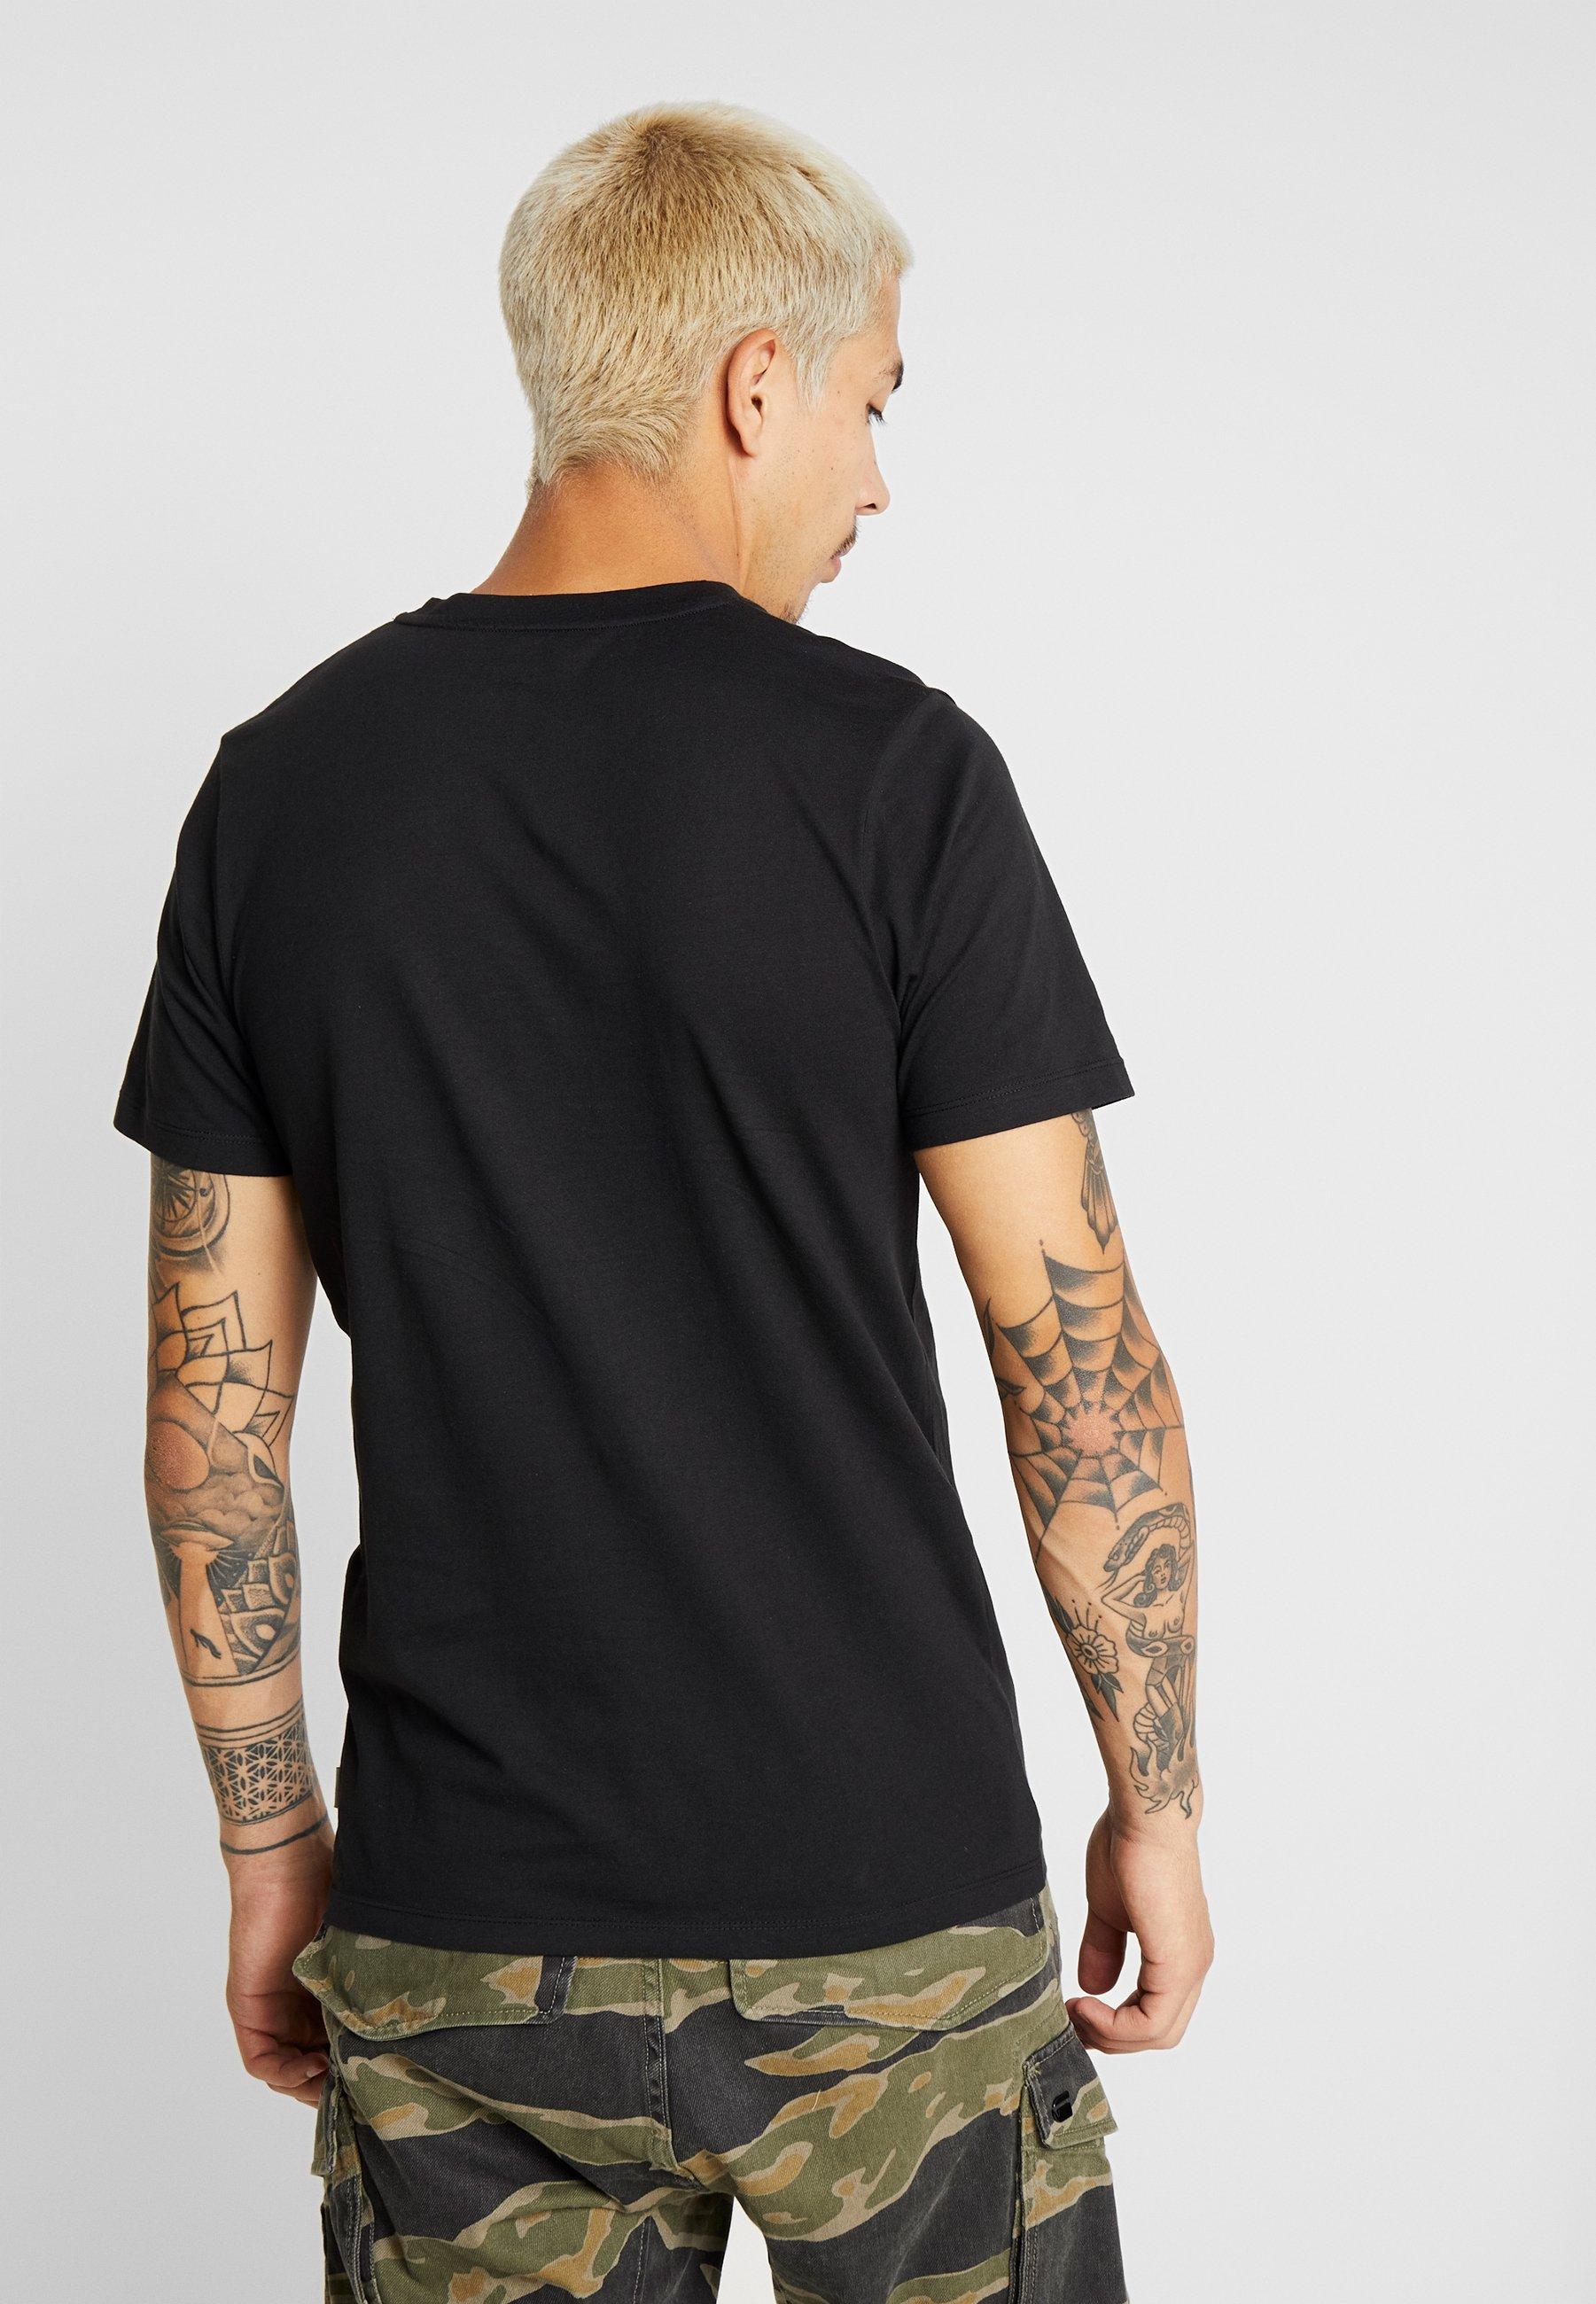 Black Tee Crew Jones Neck Jackamp; Jcolloyd FitT Imprimé Slim shirt uc5lJTFK13